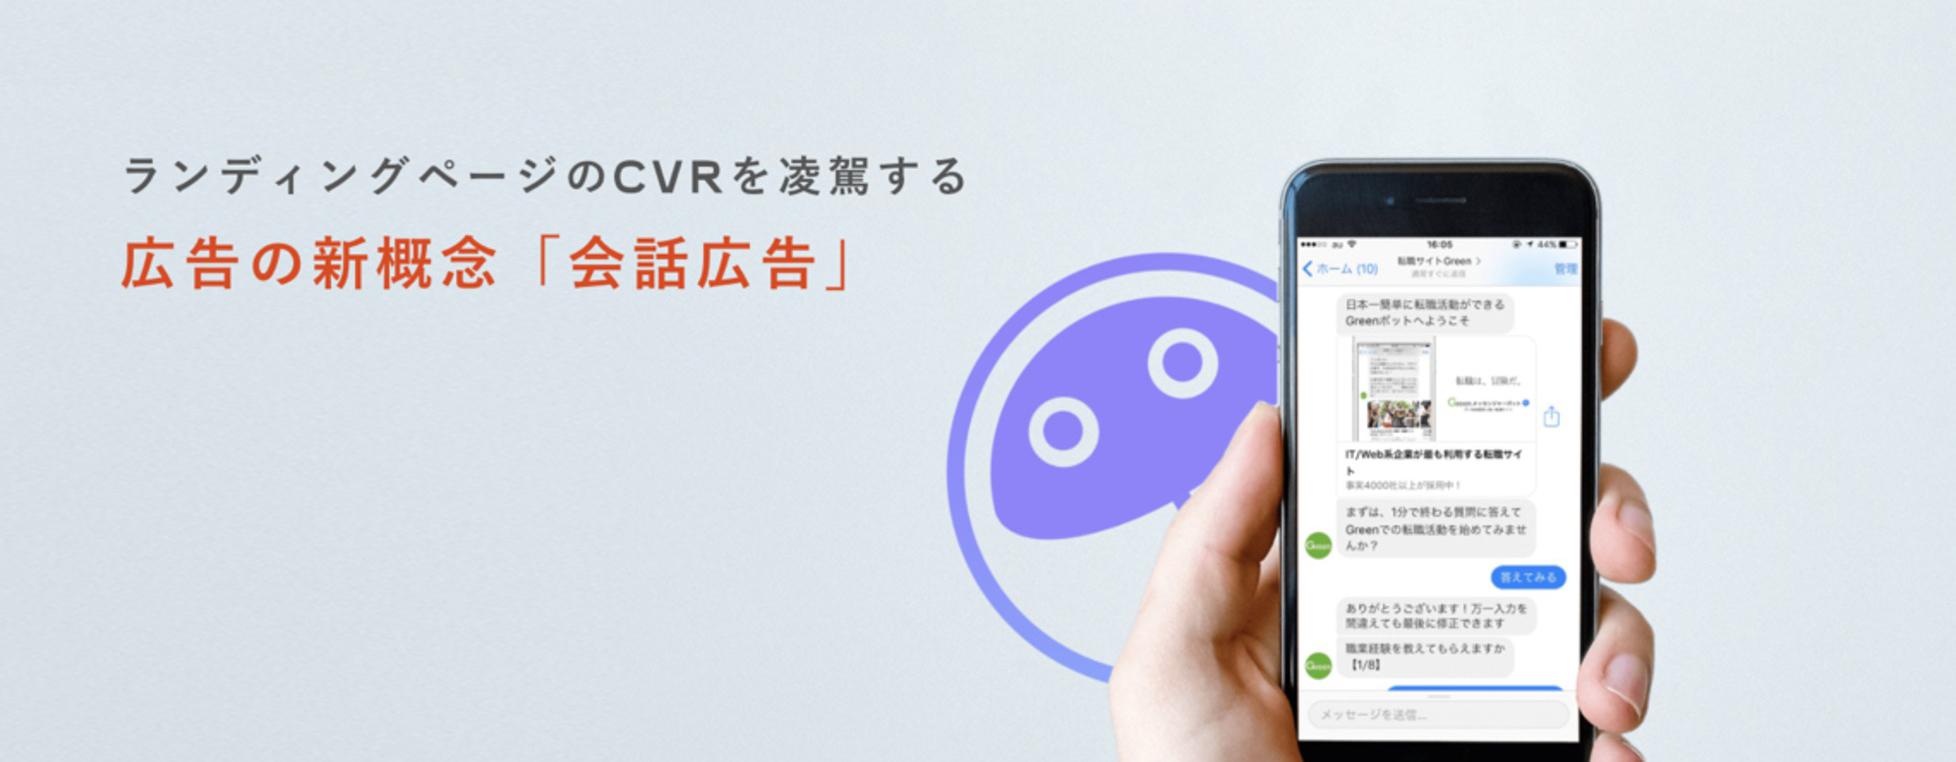 Facebook Messengerを活用できる新しい会員システム「fanp[ファンプ]」のAndroidアプリ開発